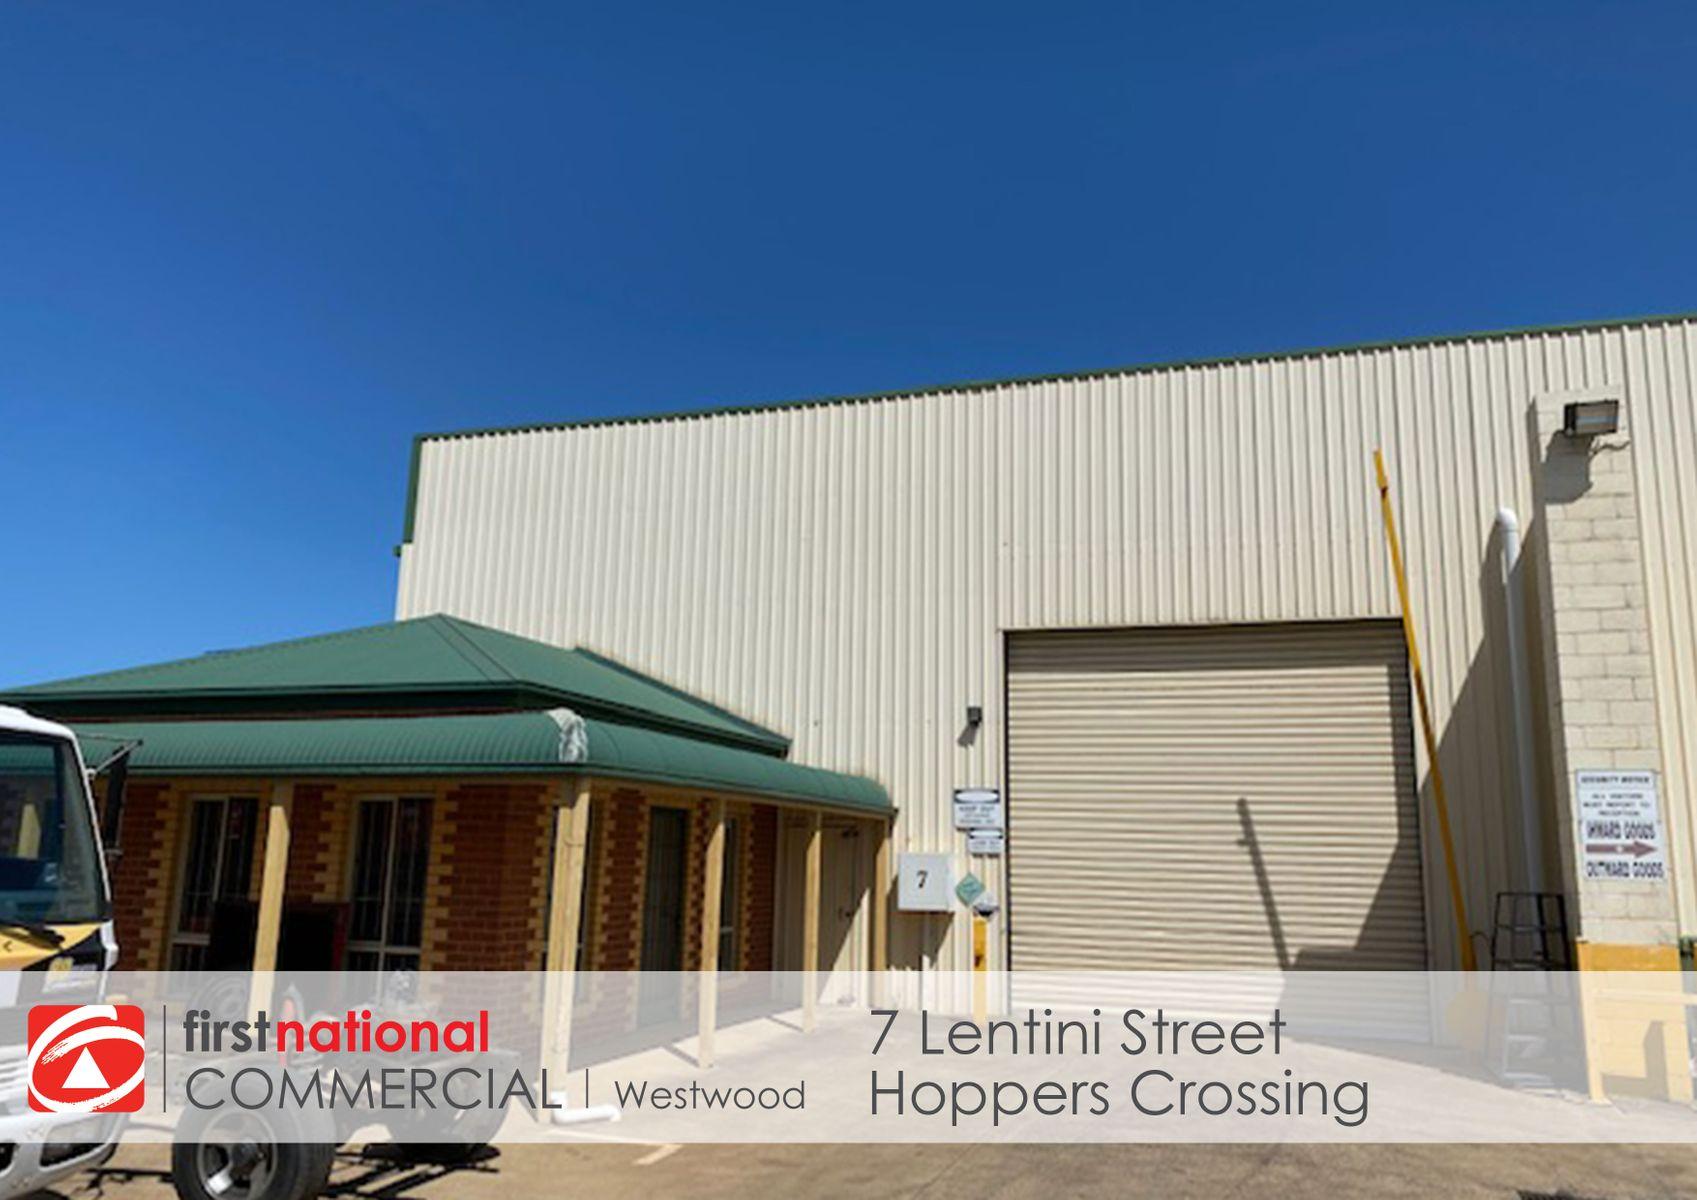 7 Lentini Street, Hoppers Crossing, VIC 3029